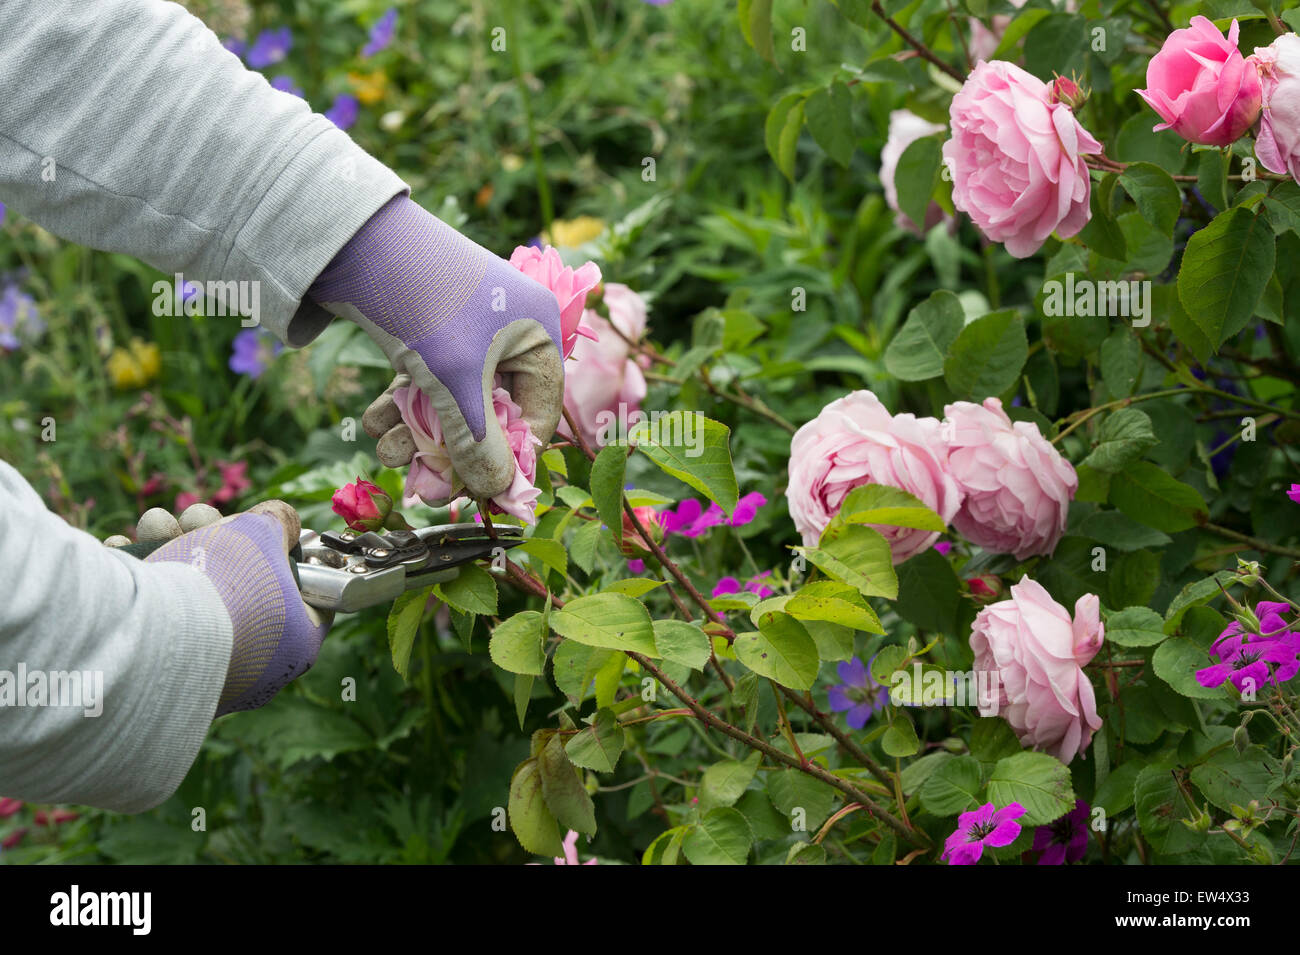 Gardener wearing gardening gloves deadheading Rosa Gertrude Jekyll rose with secateurs in a garden - Stock Image